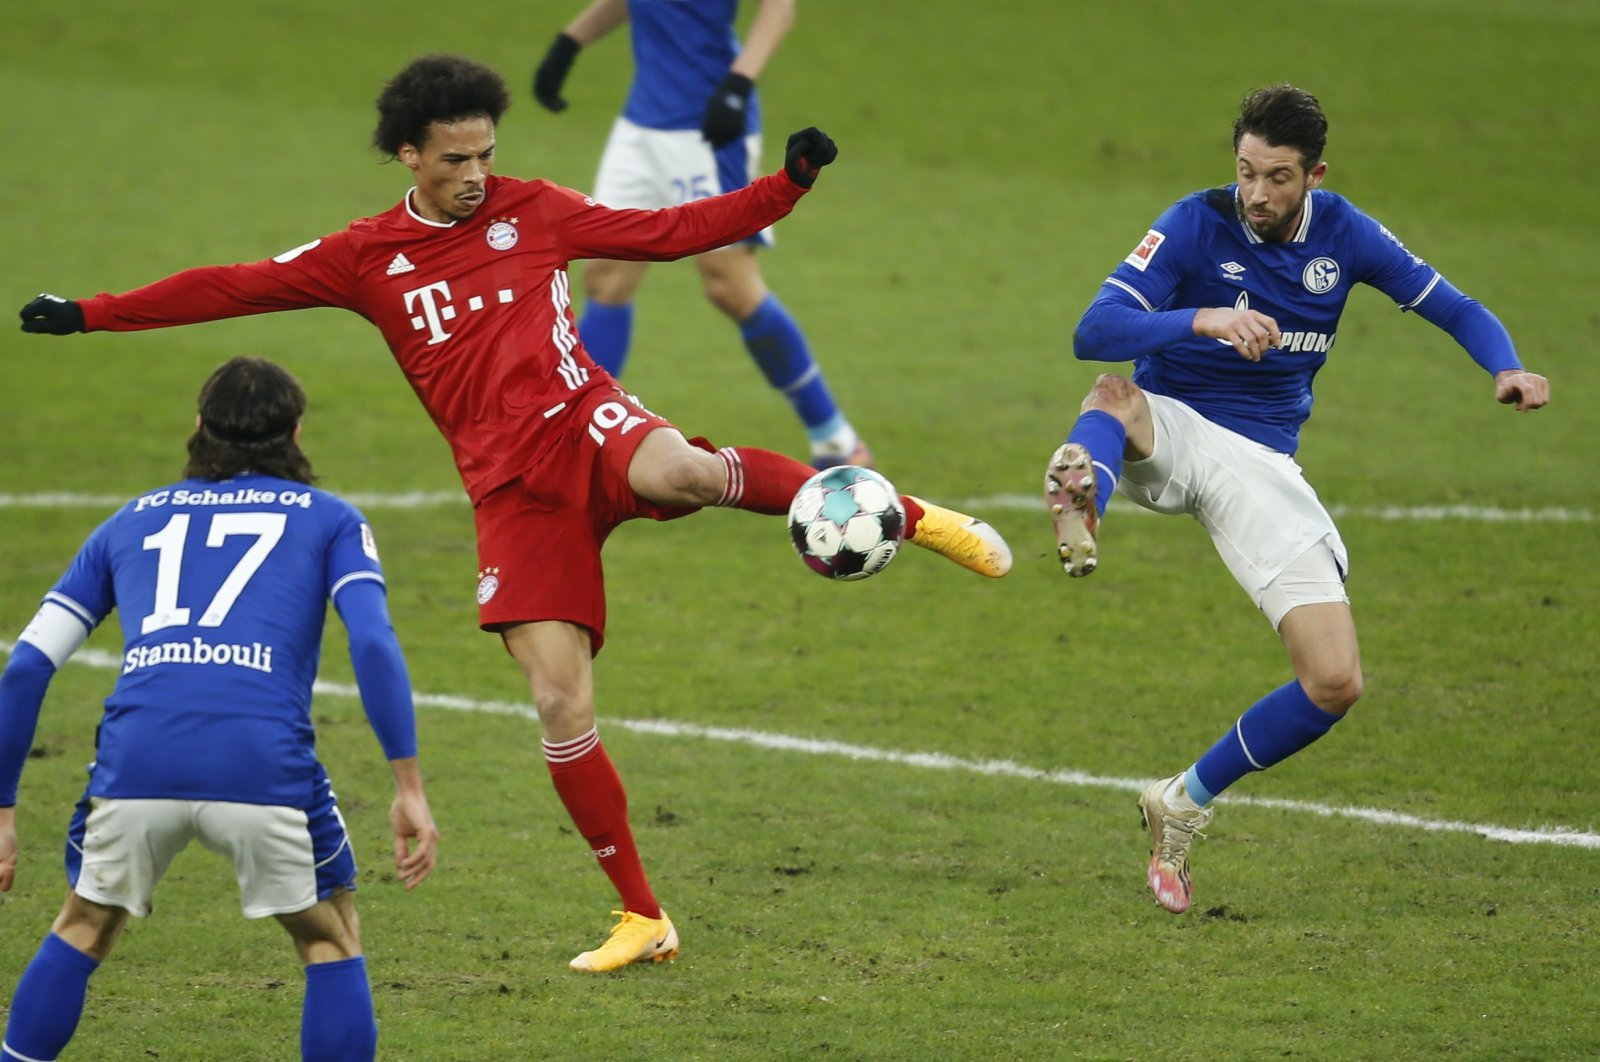 Bayern Munich's Leroy Sane (L) and Schalke's Mark Uth vie for the ball during a Bundesliga match in Gelsenkirchen, Germany, Jan. 24, 2021. (AP Photo)